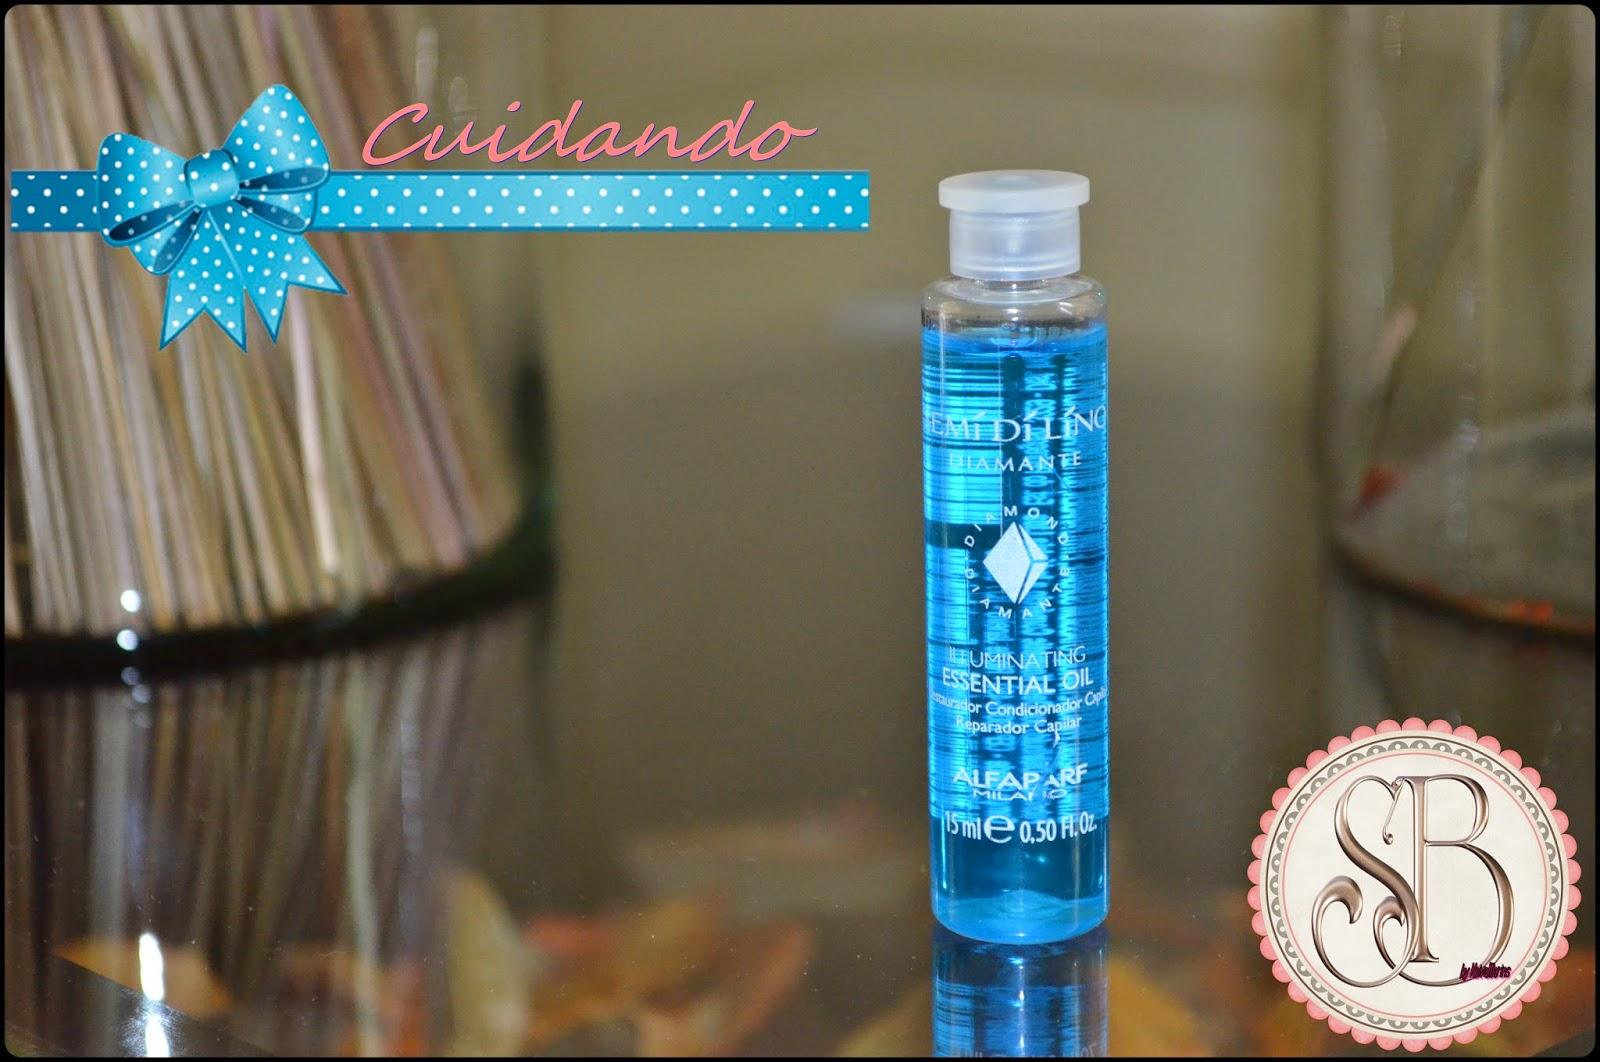 Somando Beleza, Ampola da L'Oreal Absoluti Repair, Alfaparf, Aquaflora